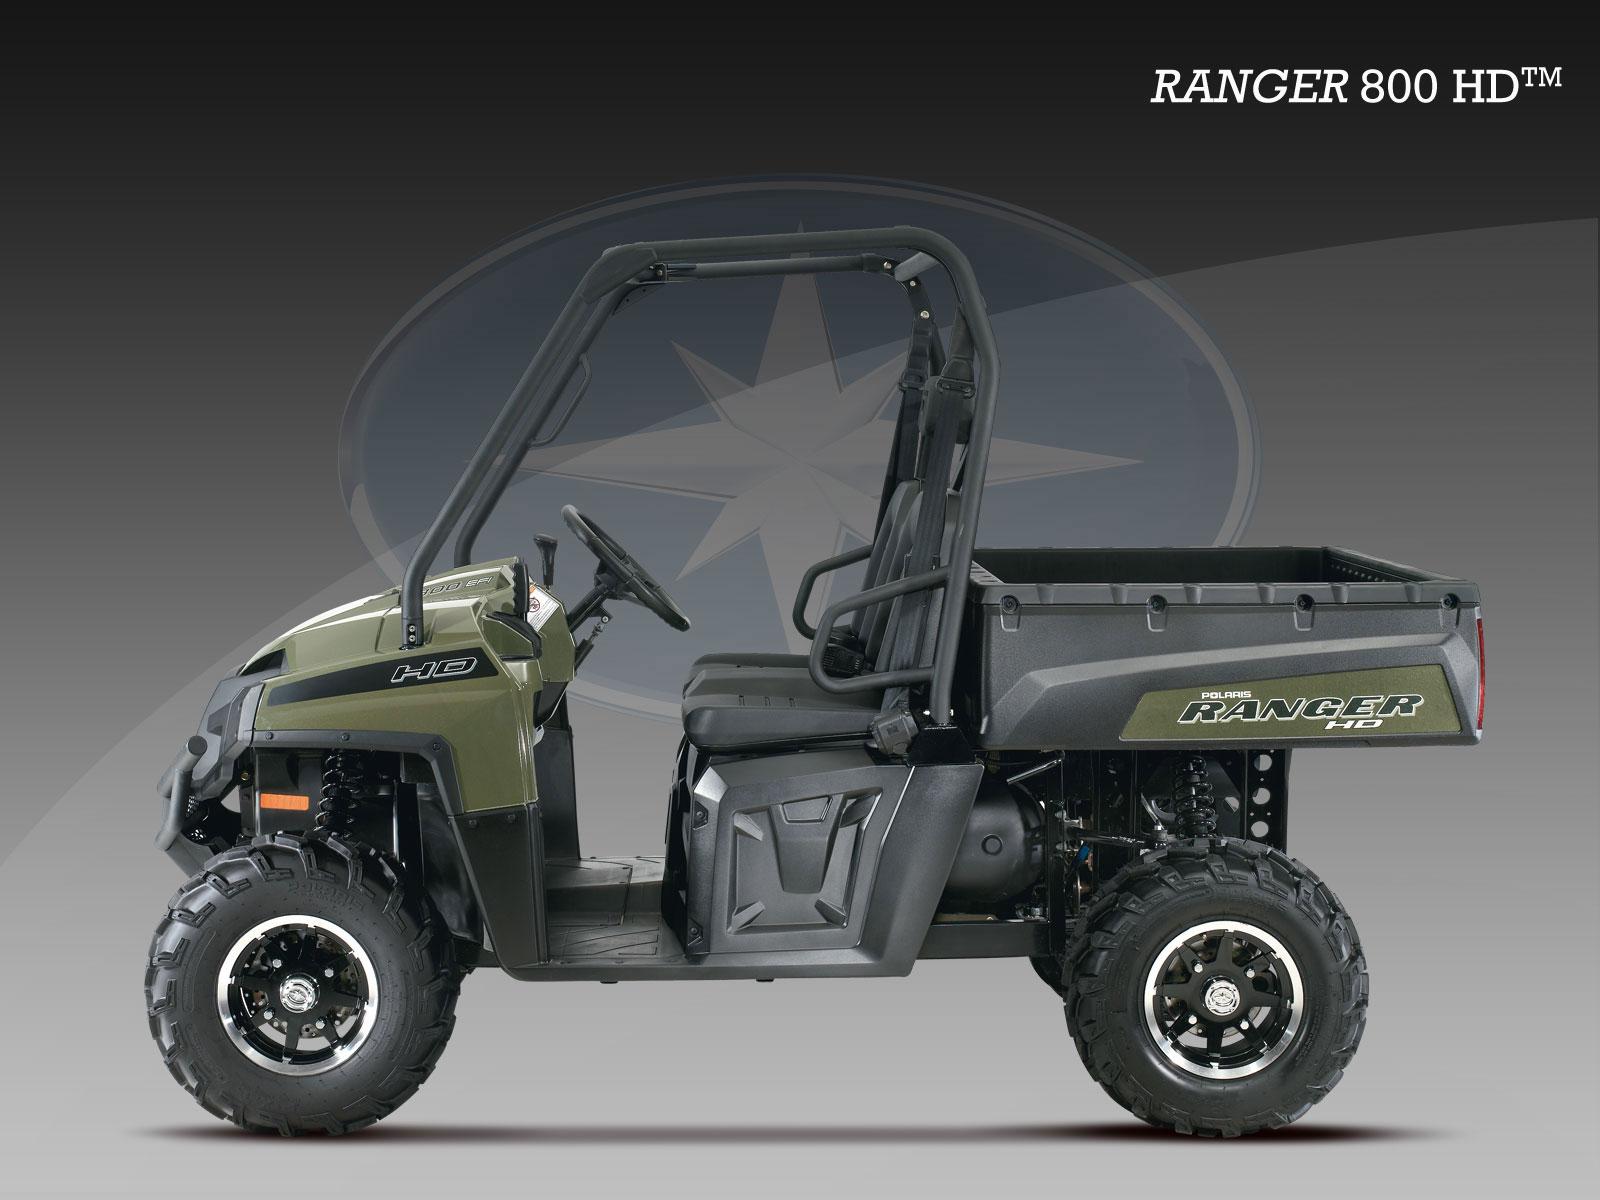 Used Polaris Ranger >> POLARIS Ranger HD 800 specs - 2009, 2010 - autoevolution